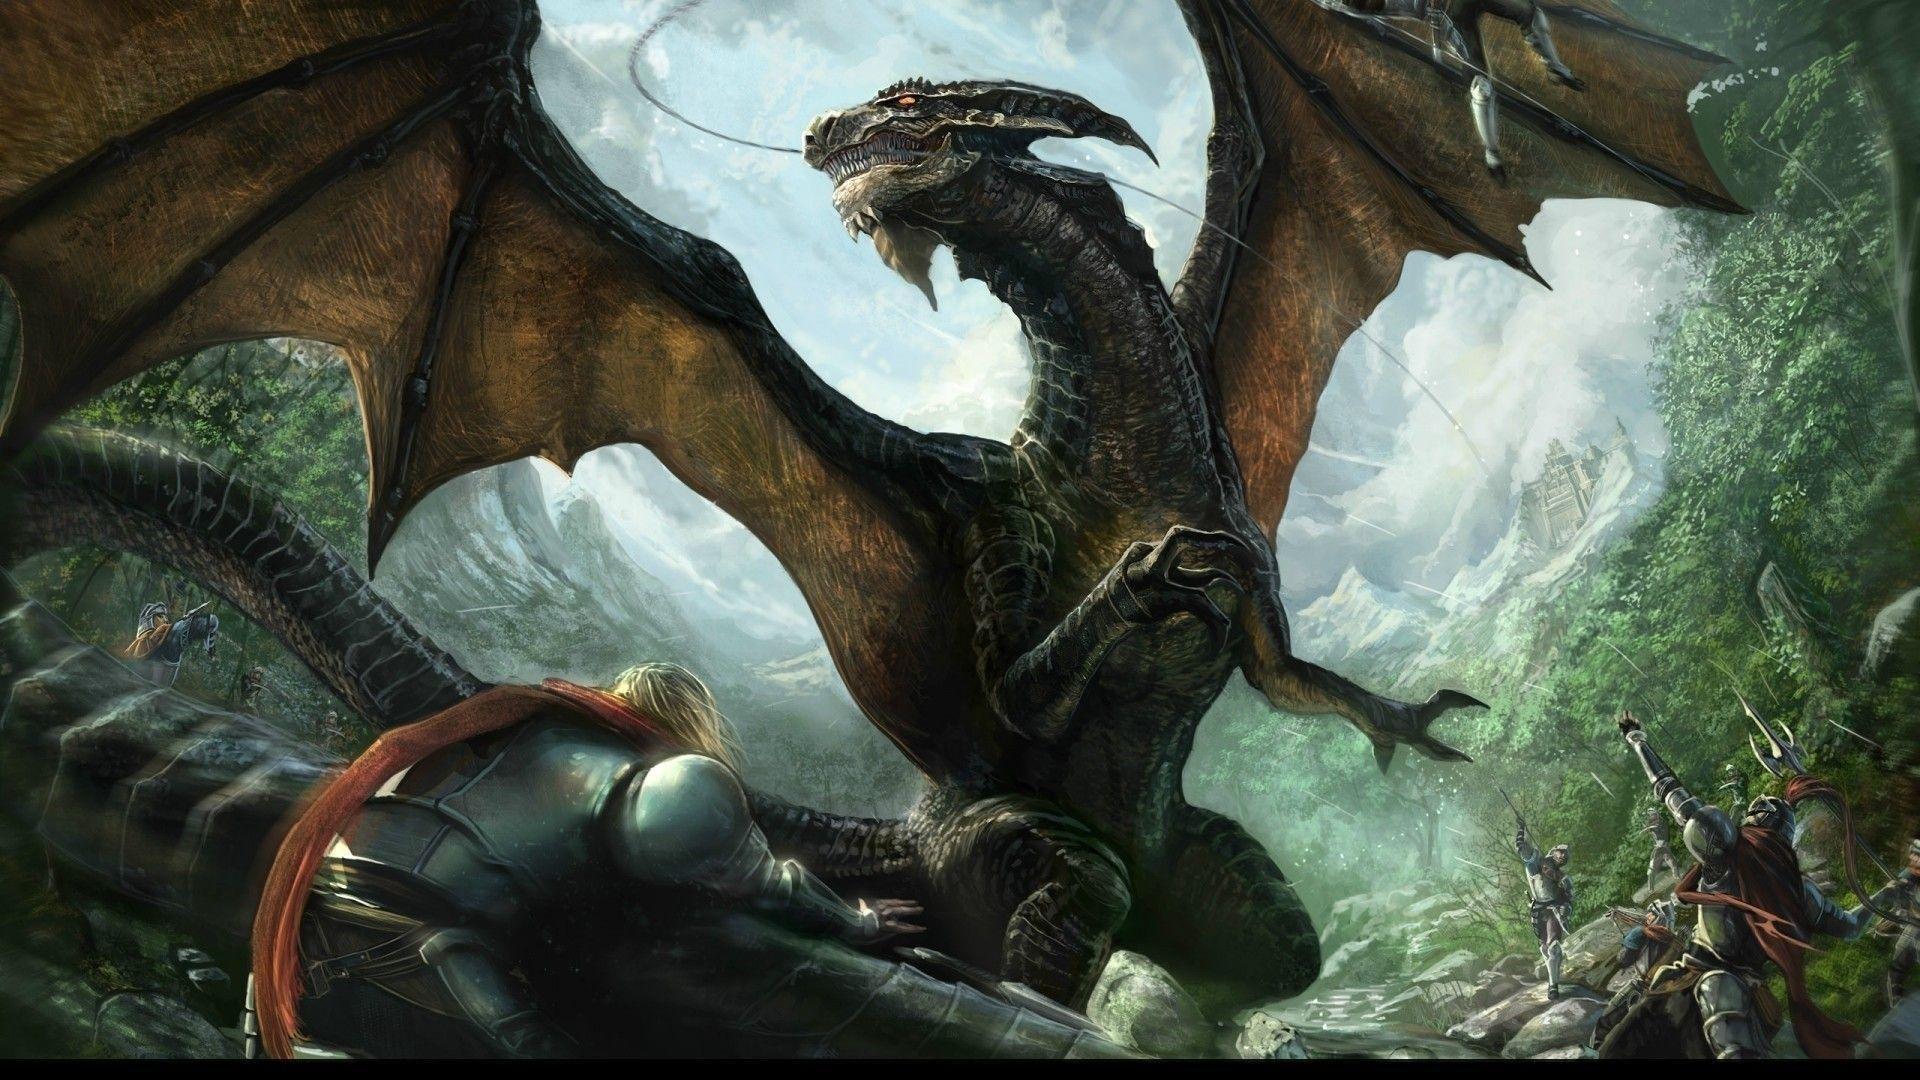 2560x1600 Dragon Fantasy Wallpaper